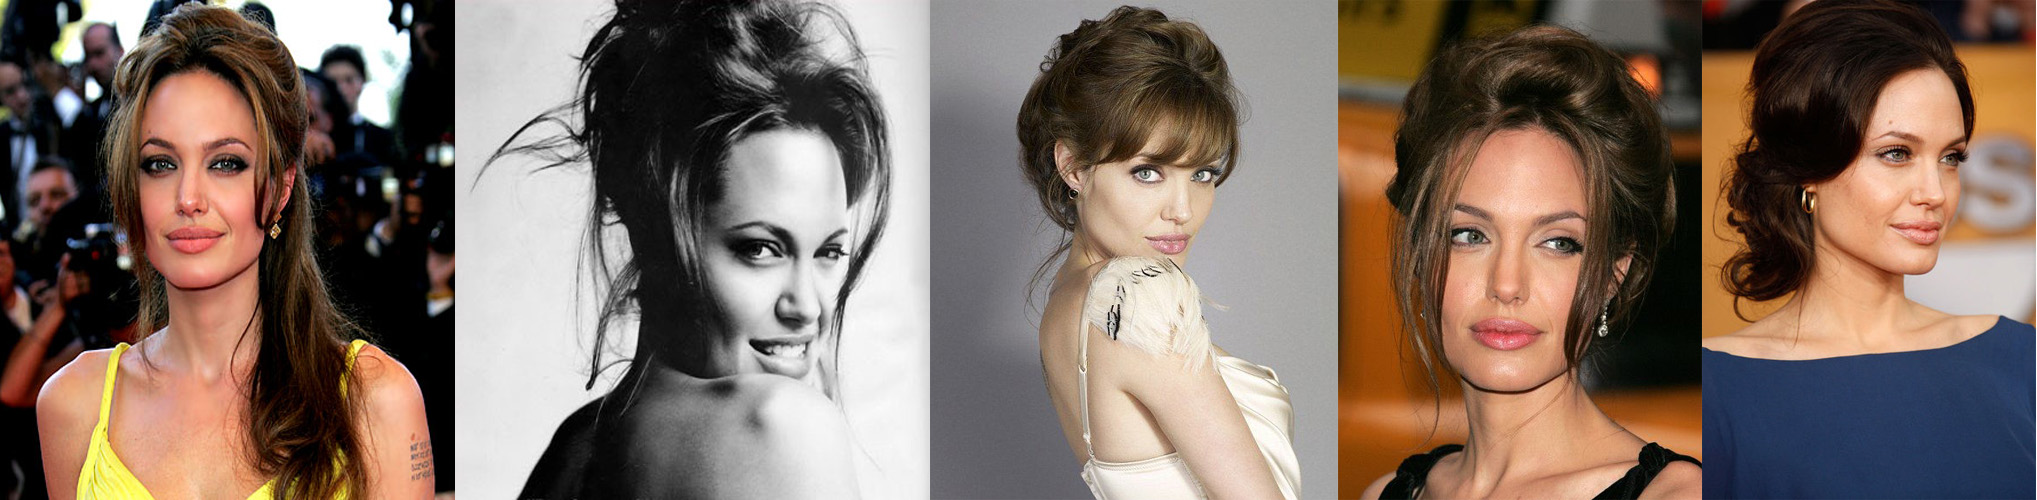 Rostro cuadrado Angelina Jolie